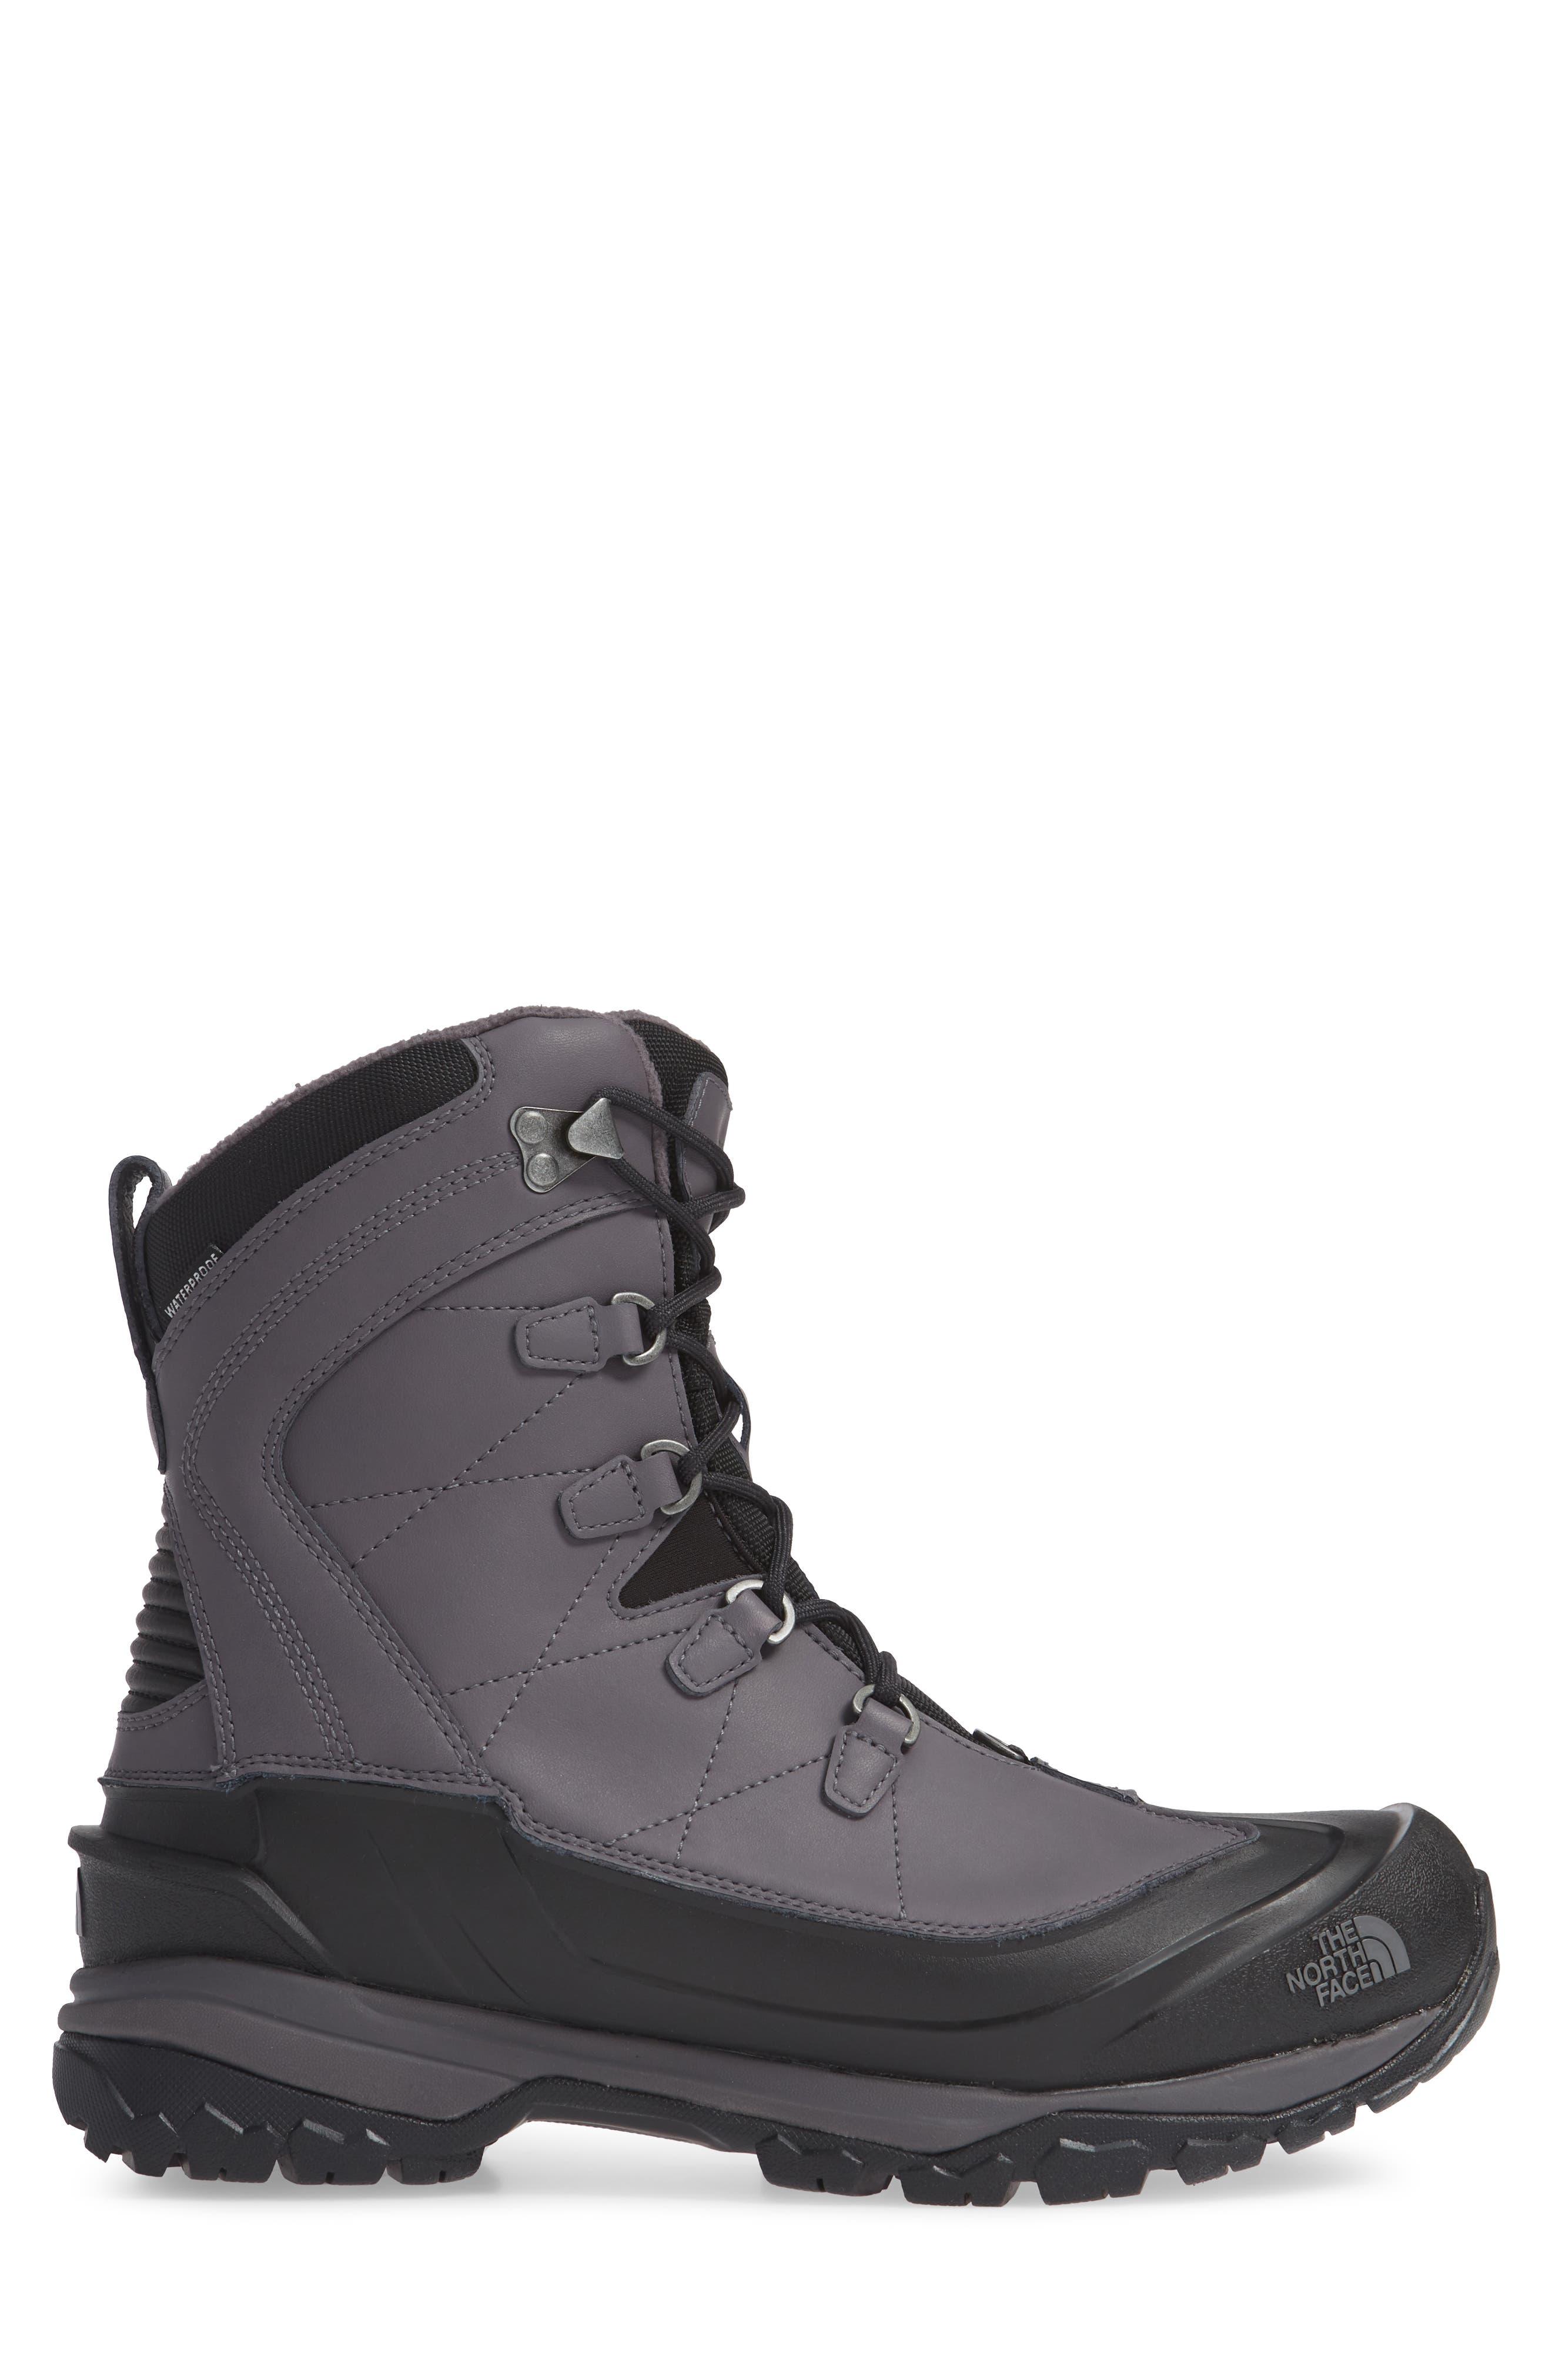 Chilkat Evo Waterproof Insulated Snow Boot,                             Alternate thumbnail 3, color,                             BLACKENED PEARL/ PHANTOM GREY